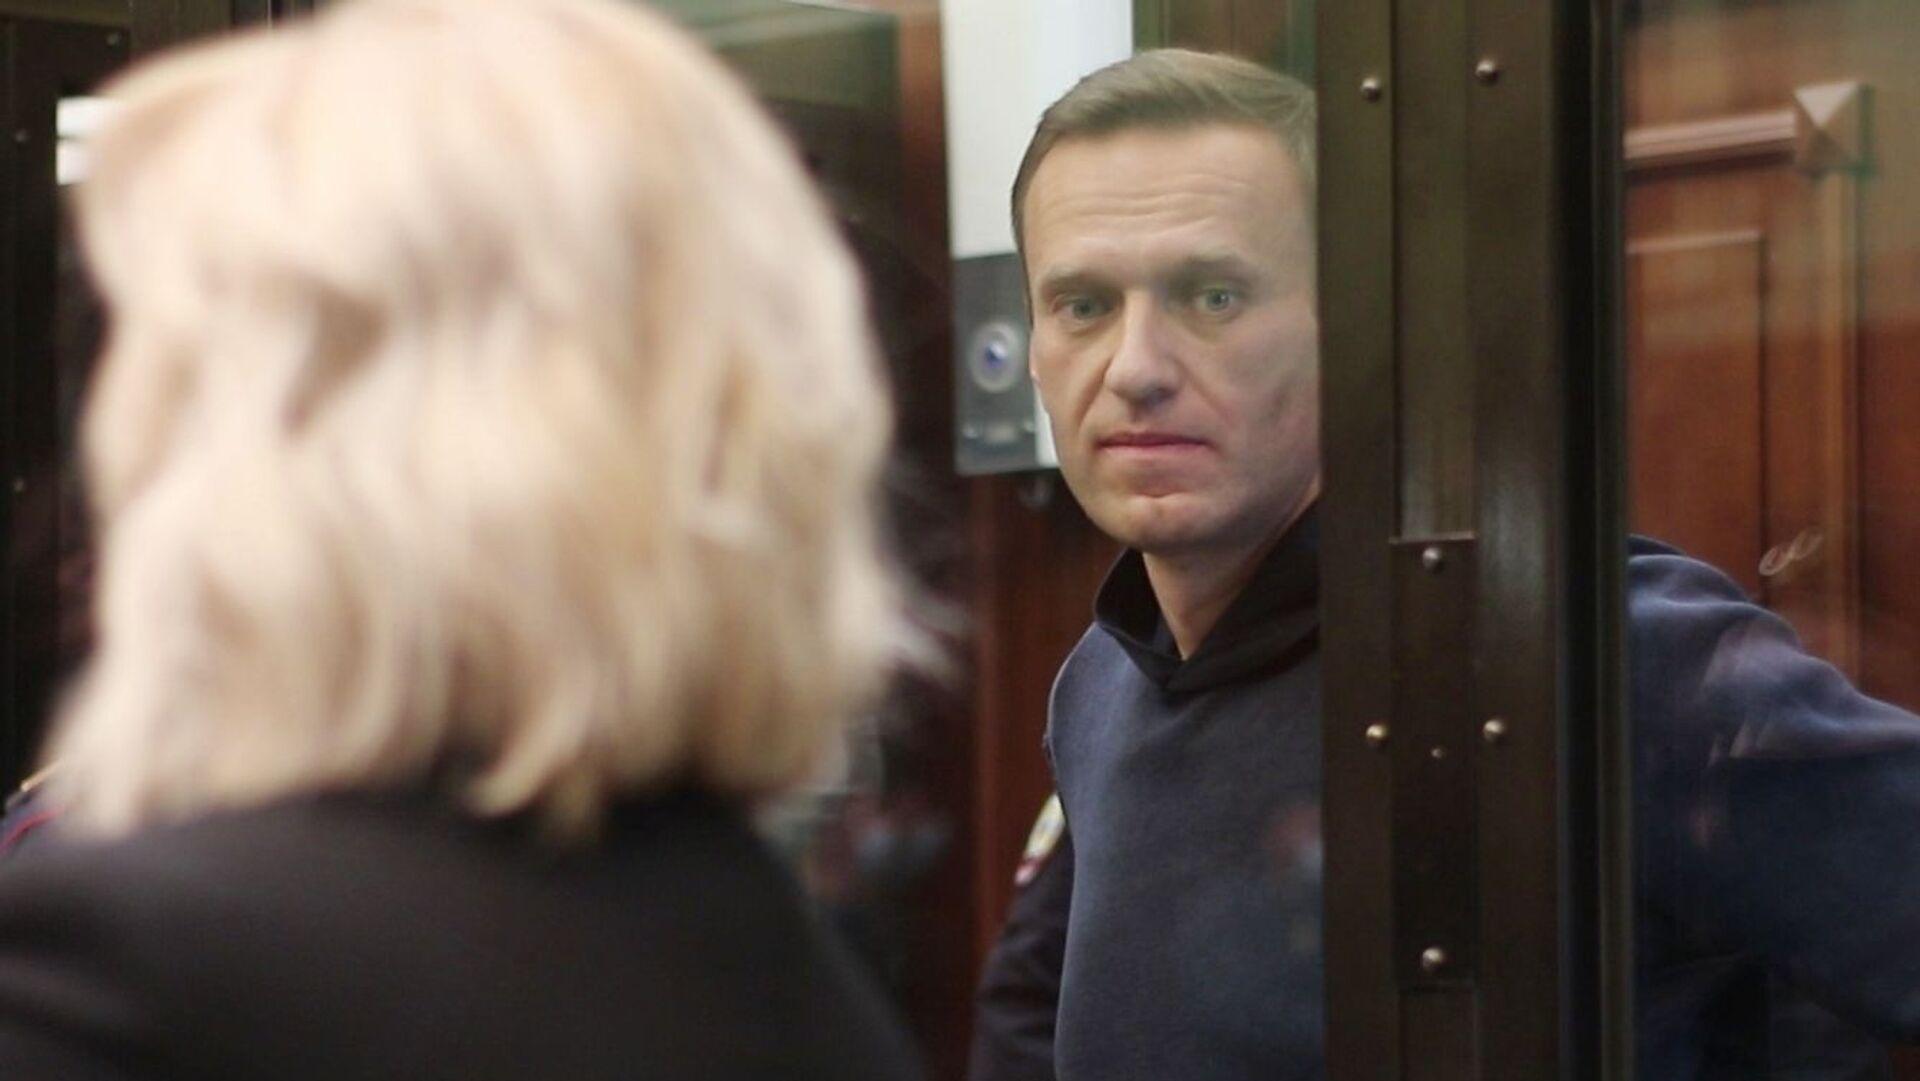 Alexéi Navalni, bloguero opositor ruso - Sputnik Mundo, 1920, 02.02.2021